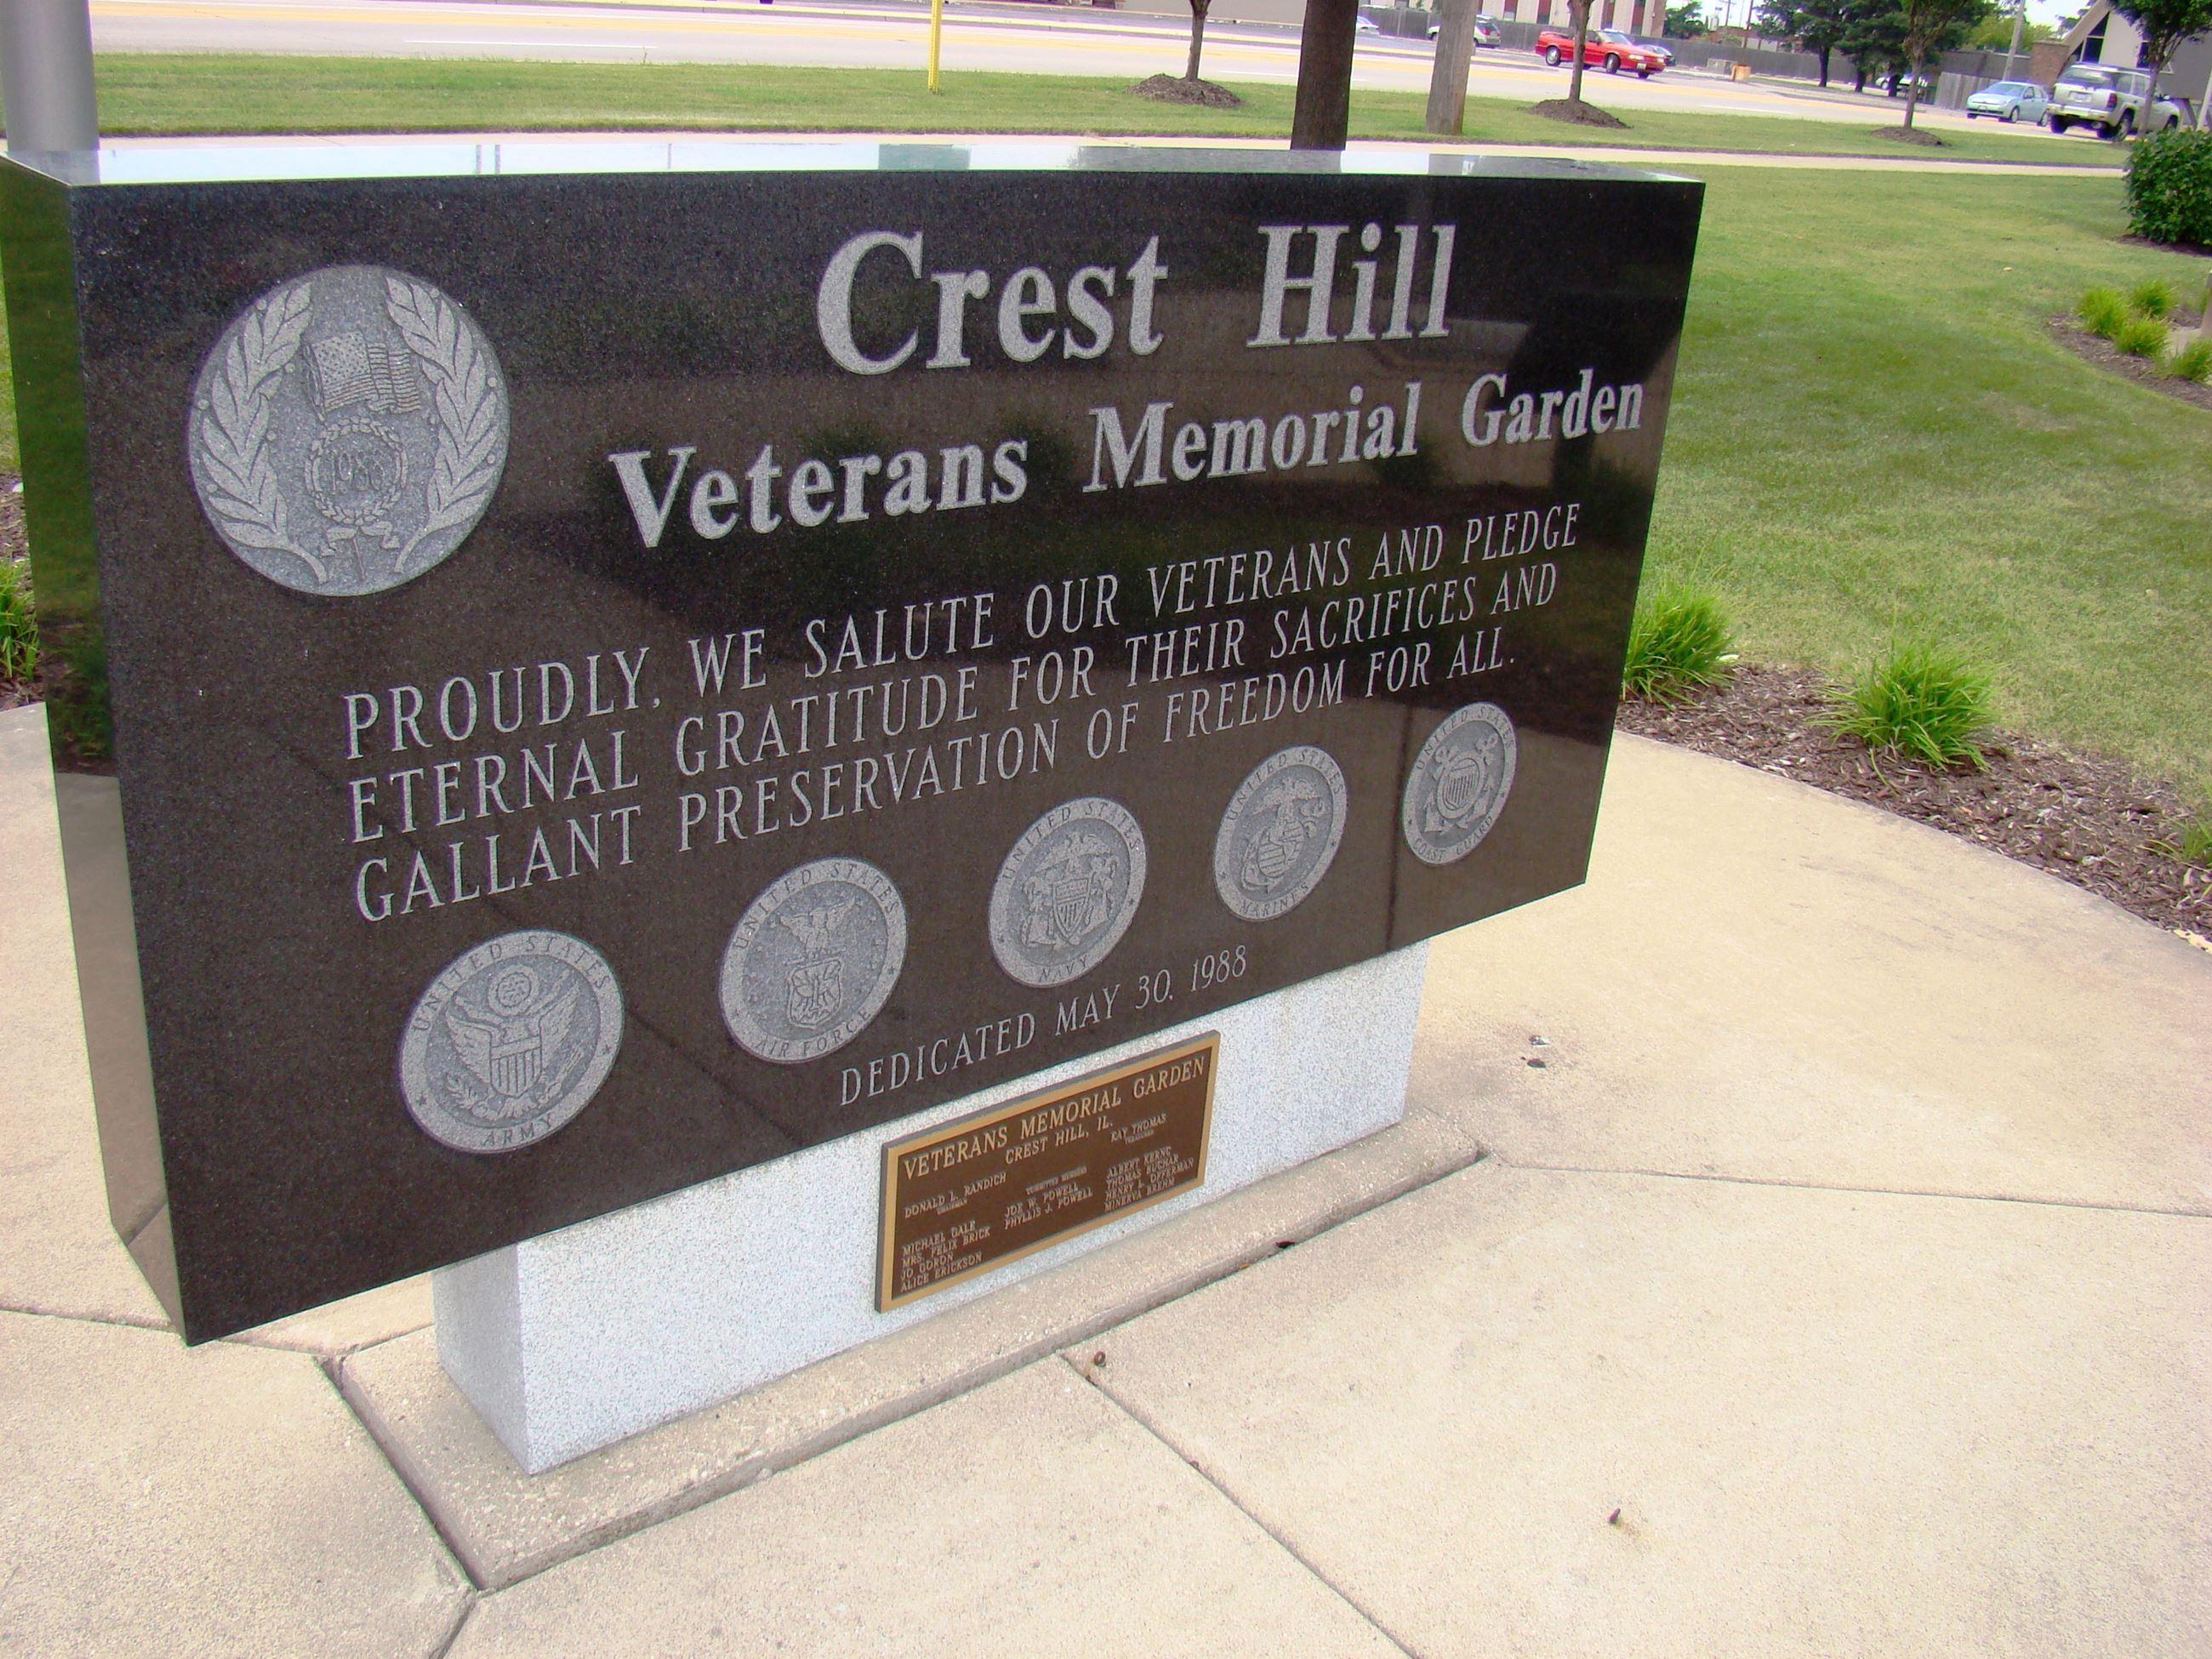 Illinois will county crest hill 60435 - Illinois Will County Crest Hill 60435 20